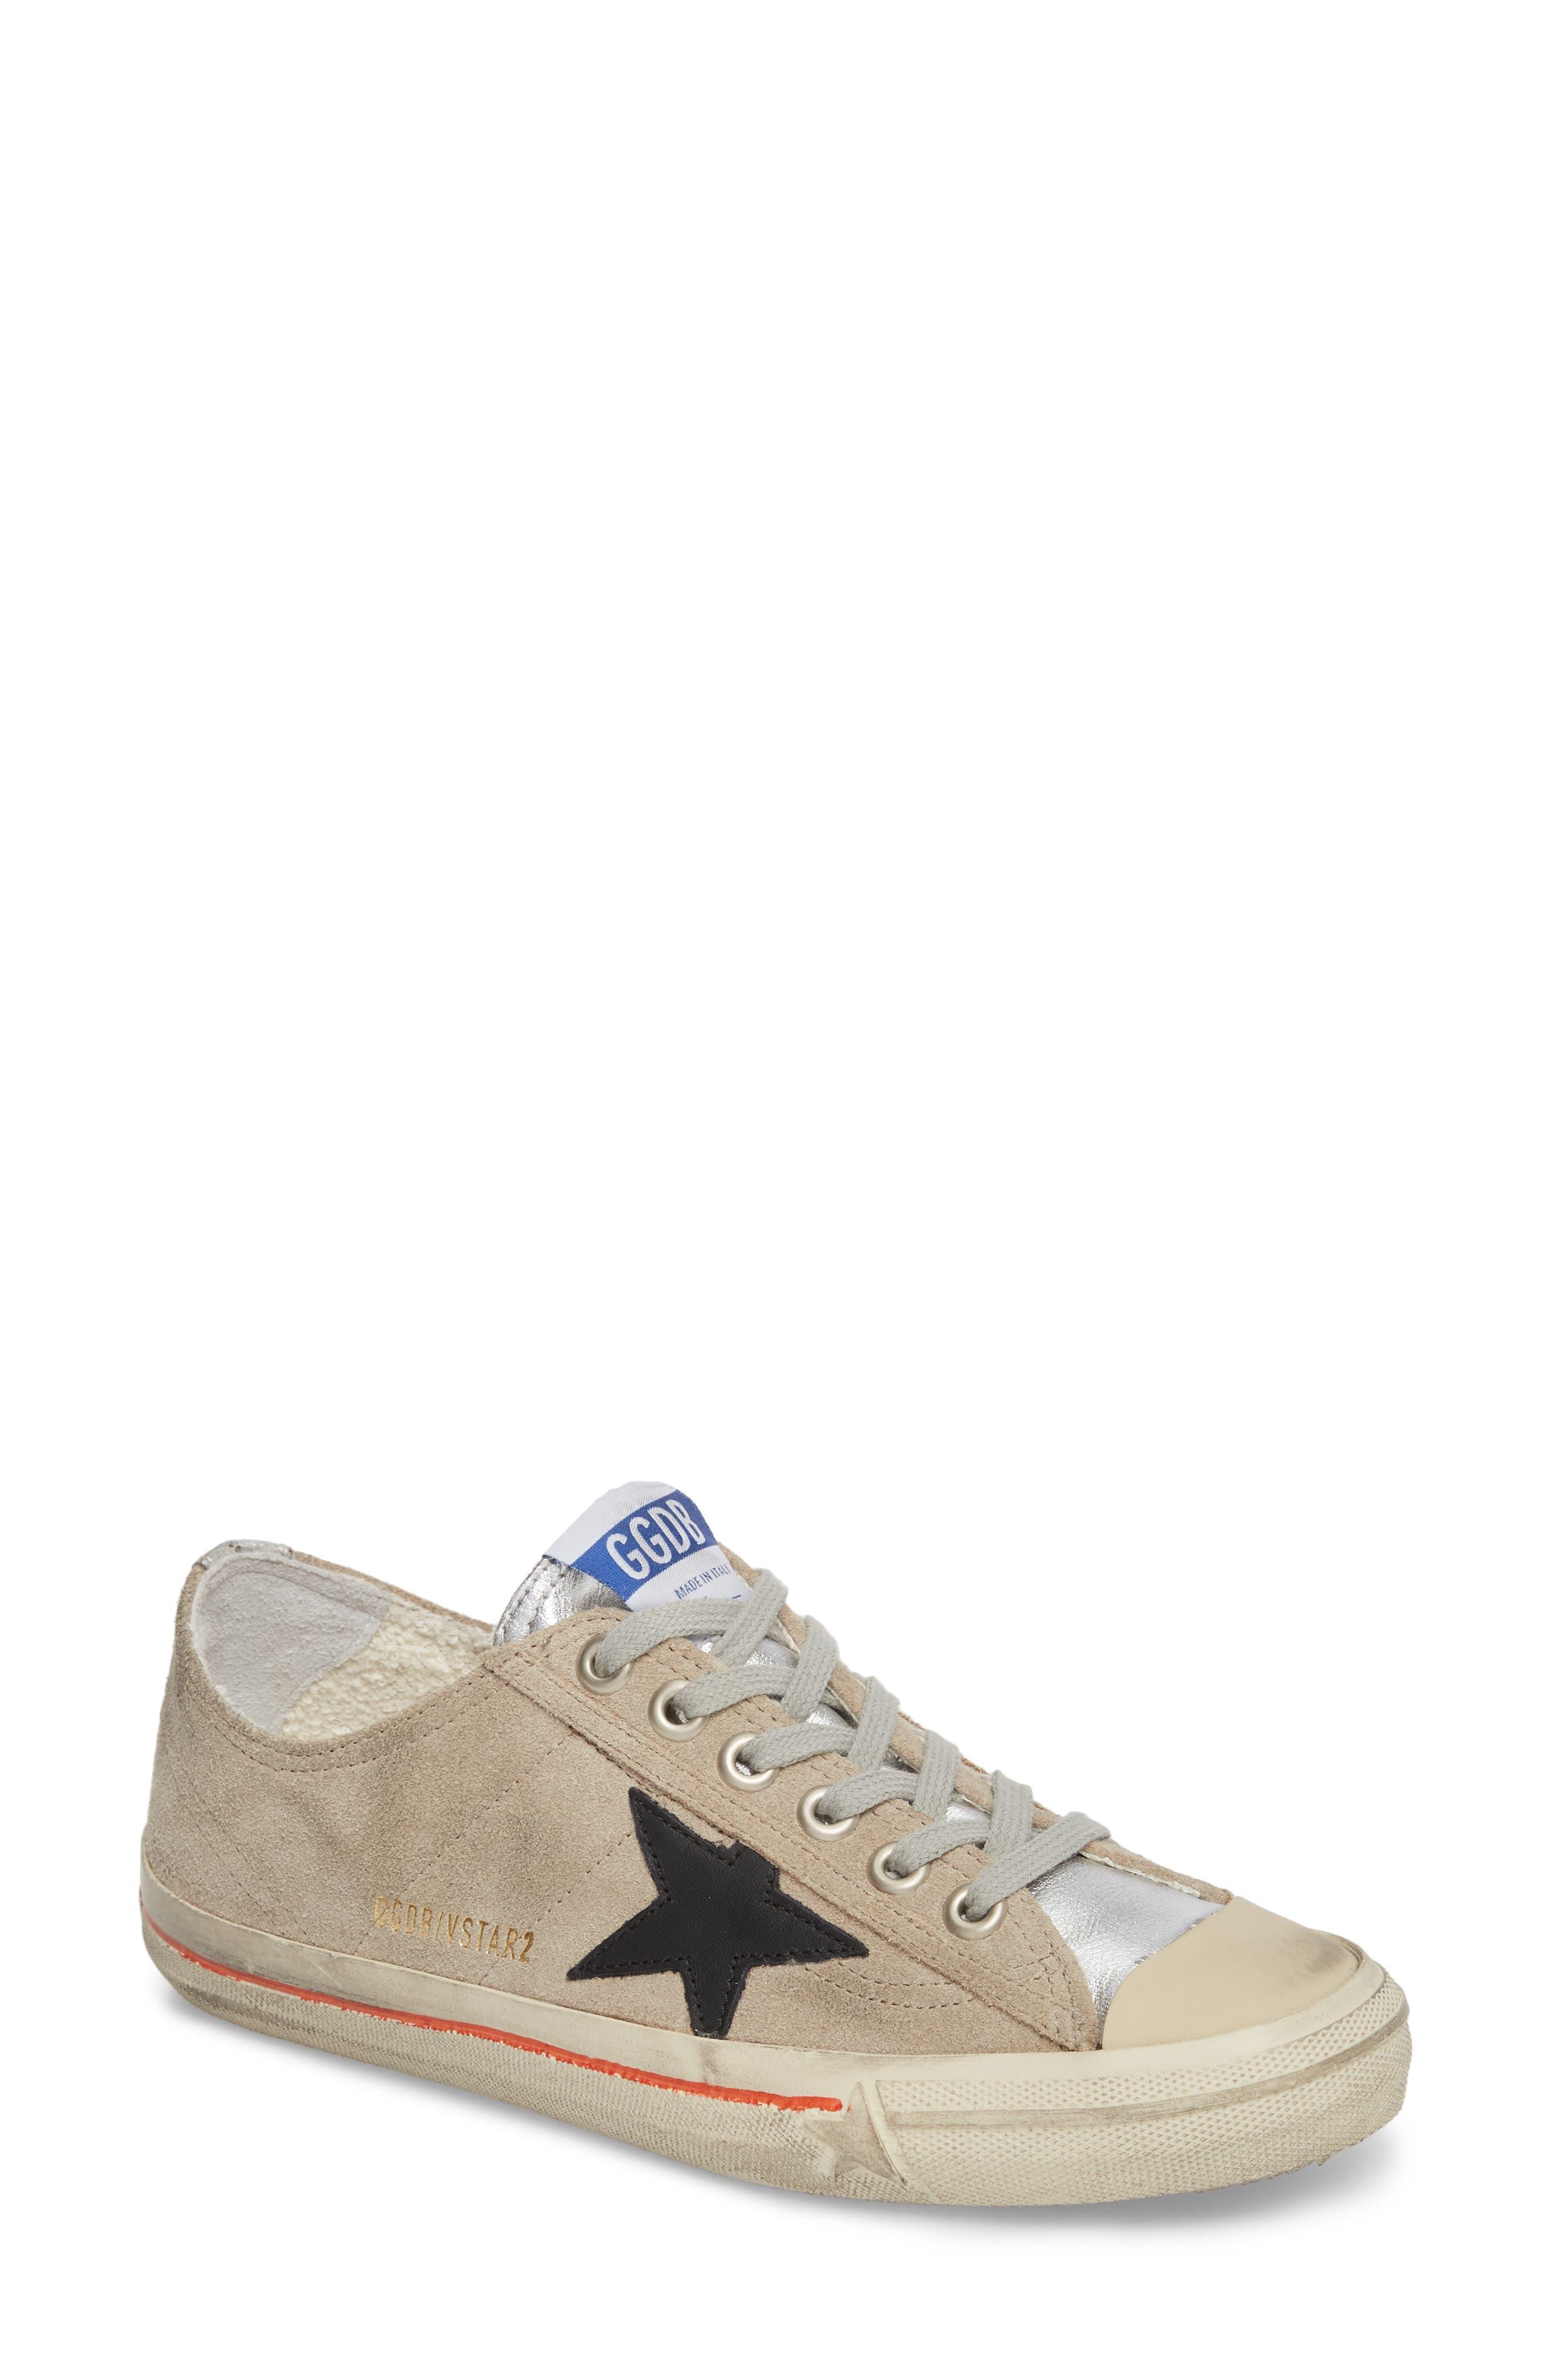 Main Image - Golden Goose V-Star 2 Low Top Sneaker (Women)